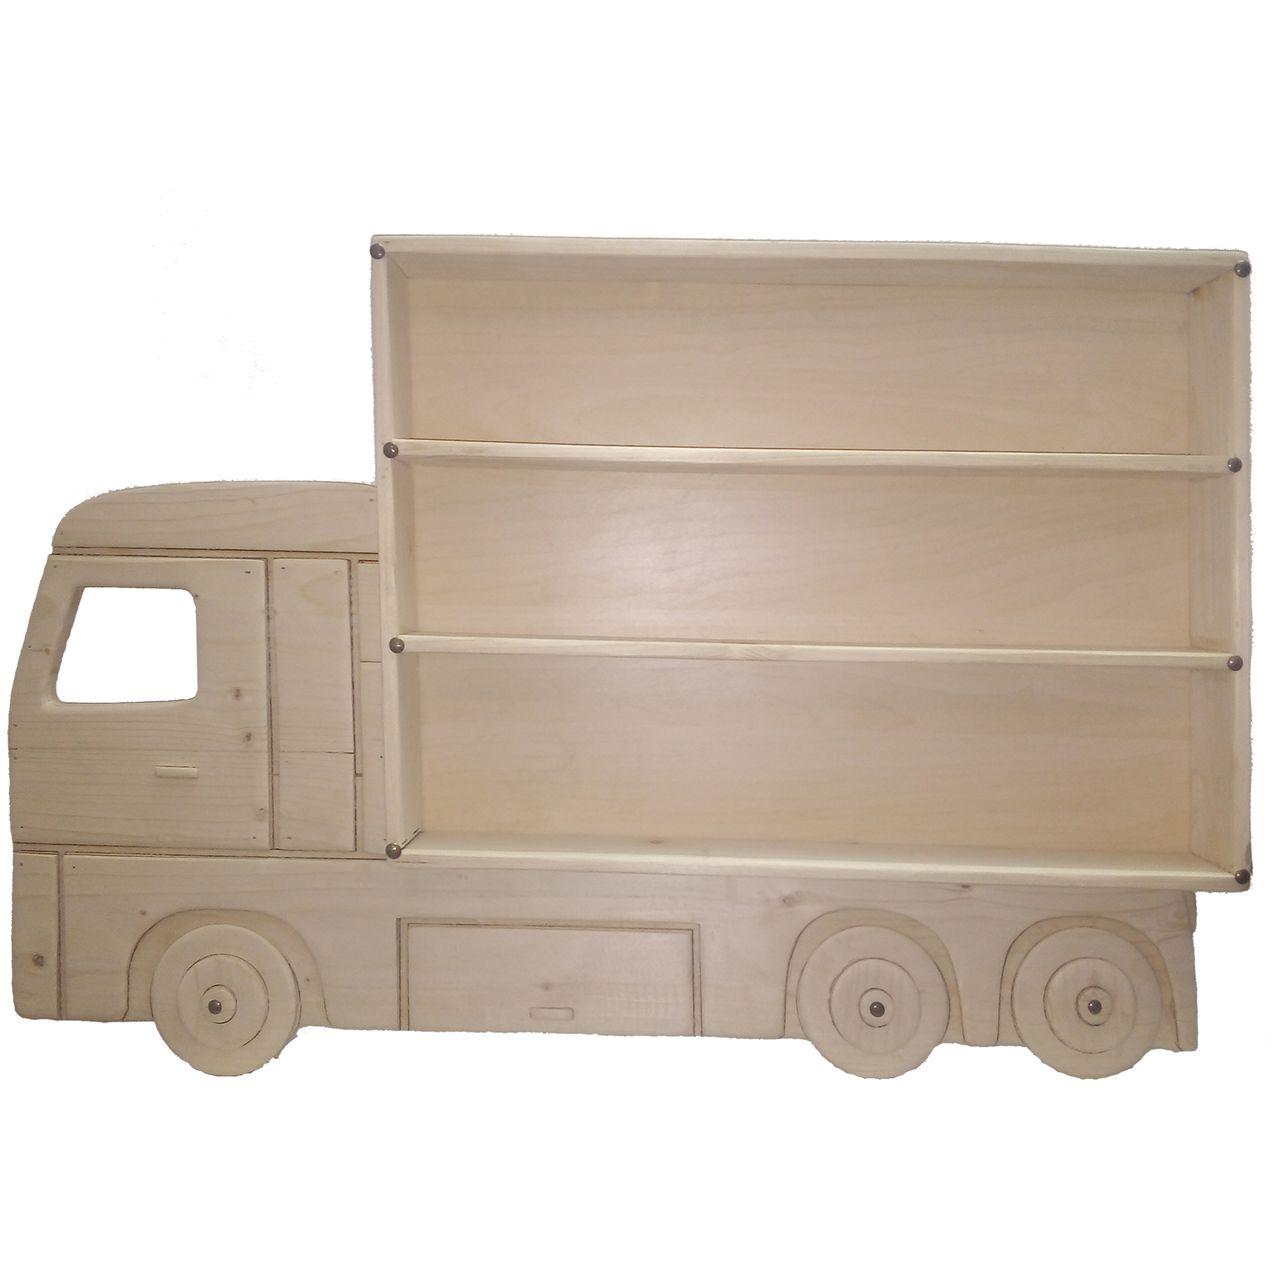 طبقه دیواری طرح کامیون